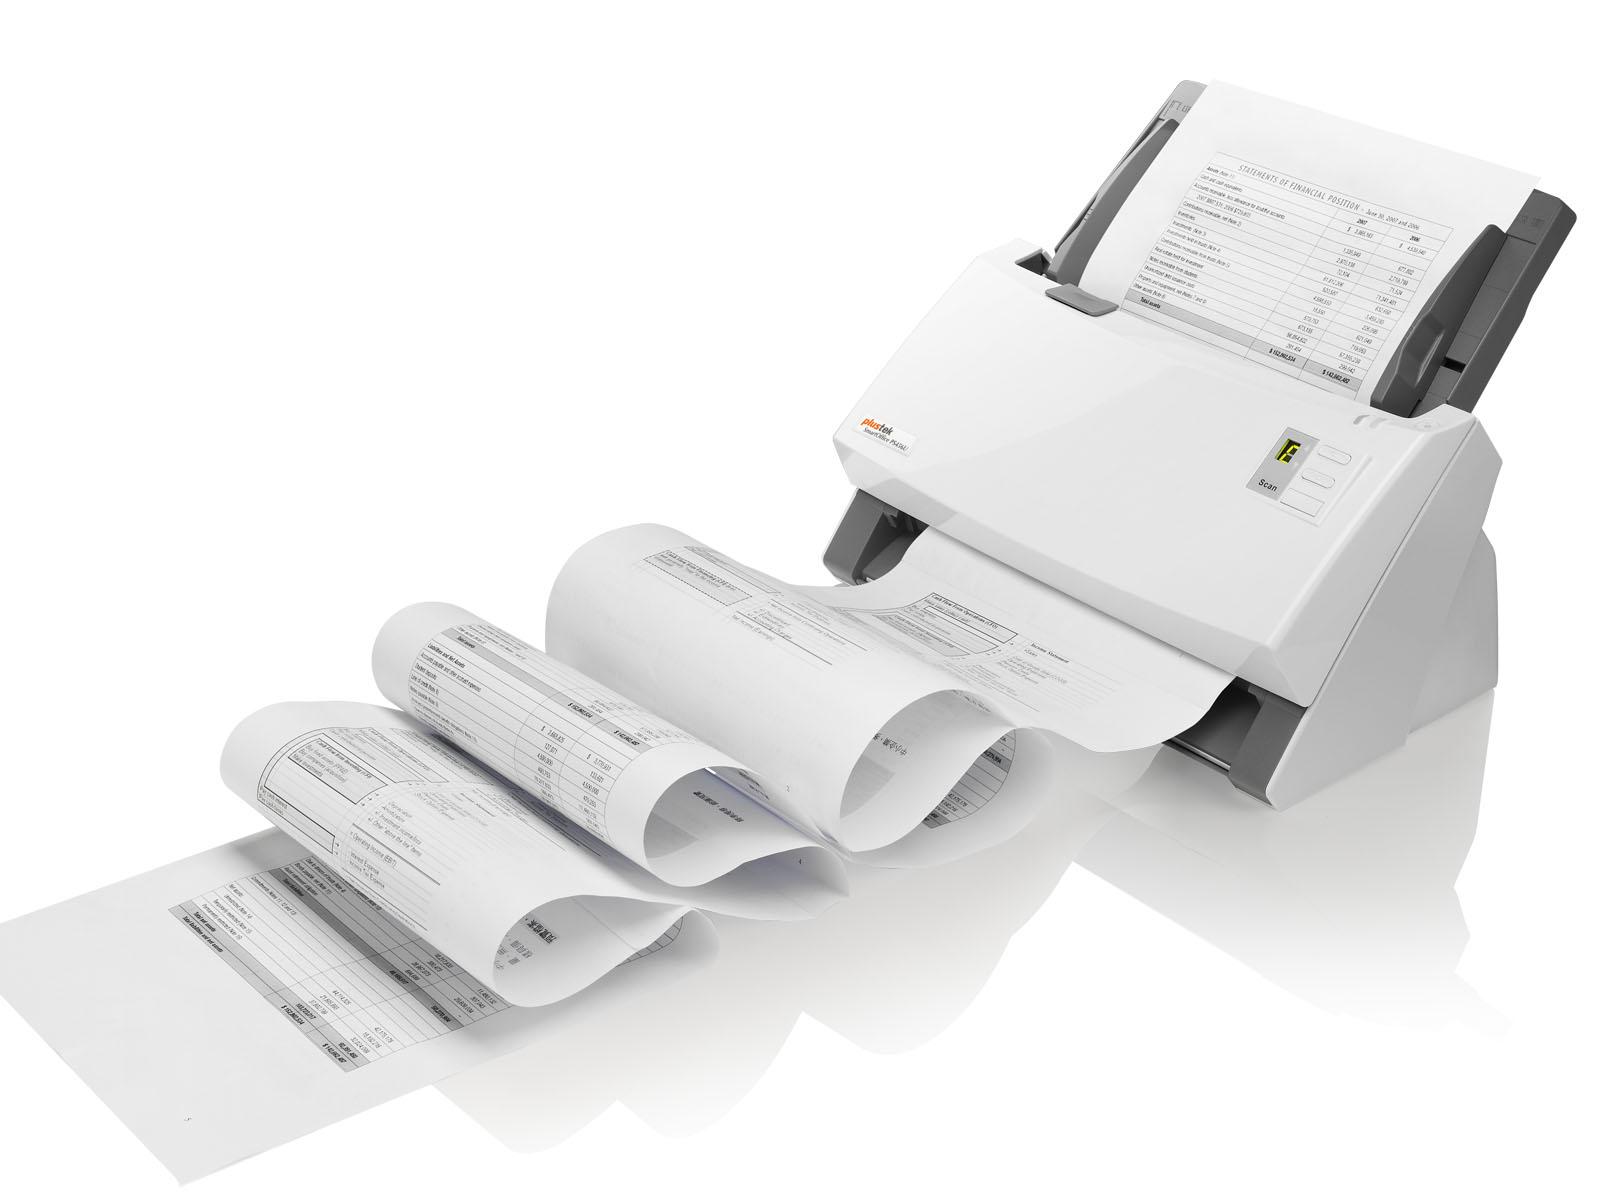 Specs Plustek Smartoffice Ps456u 600 X Dpi Adf Scanner White A4 Opticslim 1180 Jpeg Original 11144kb